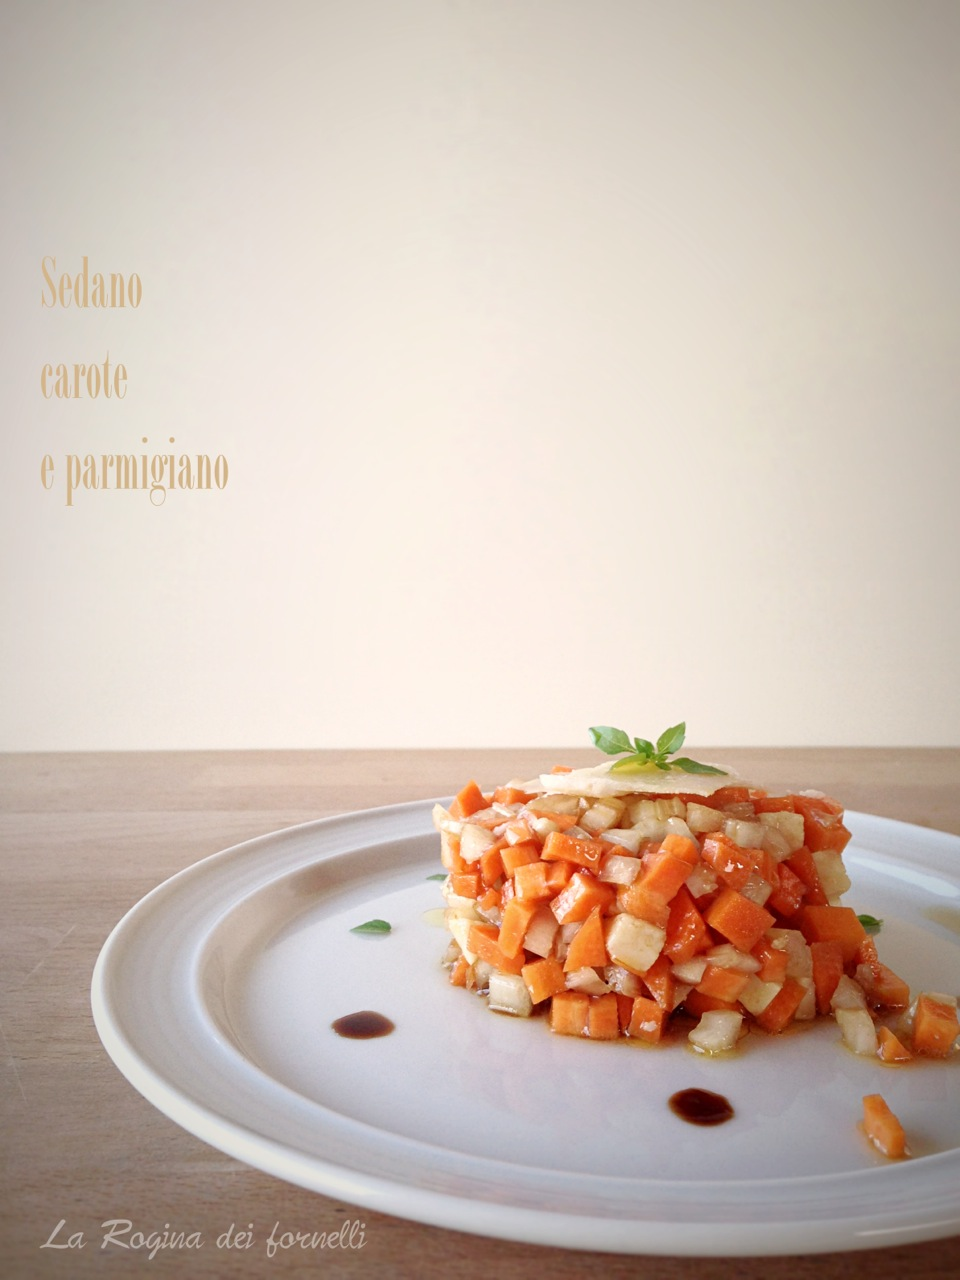 insalata-sedano-carote-parmigiano